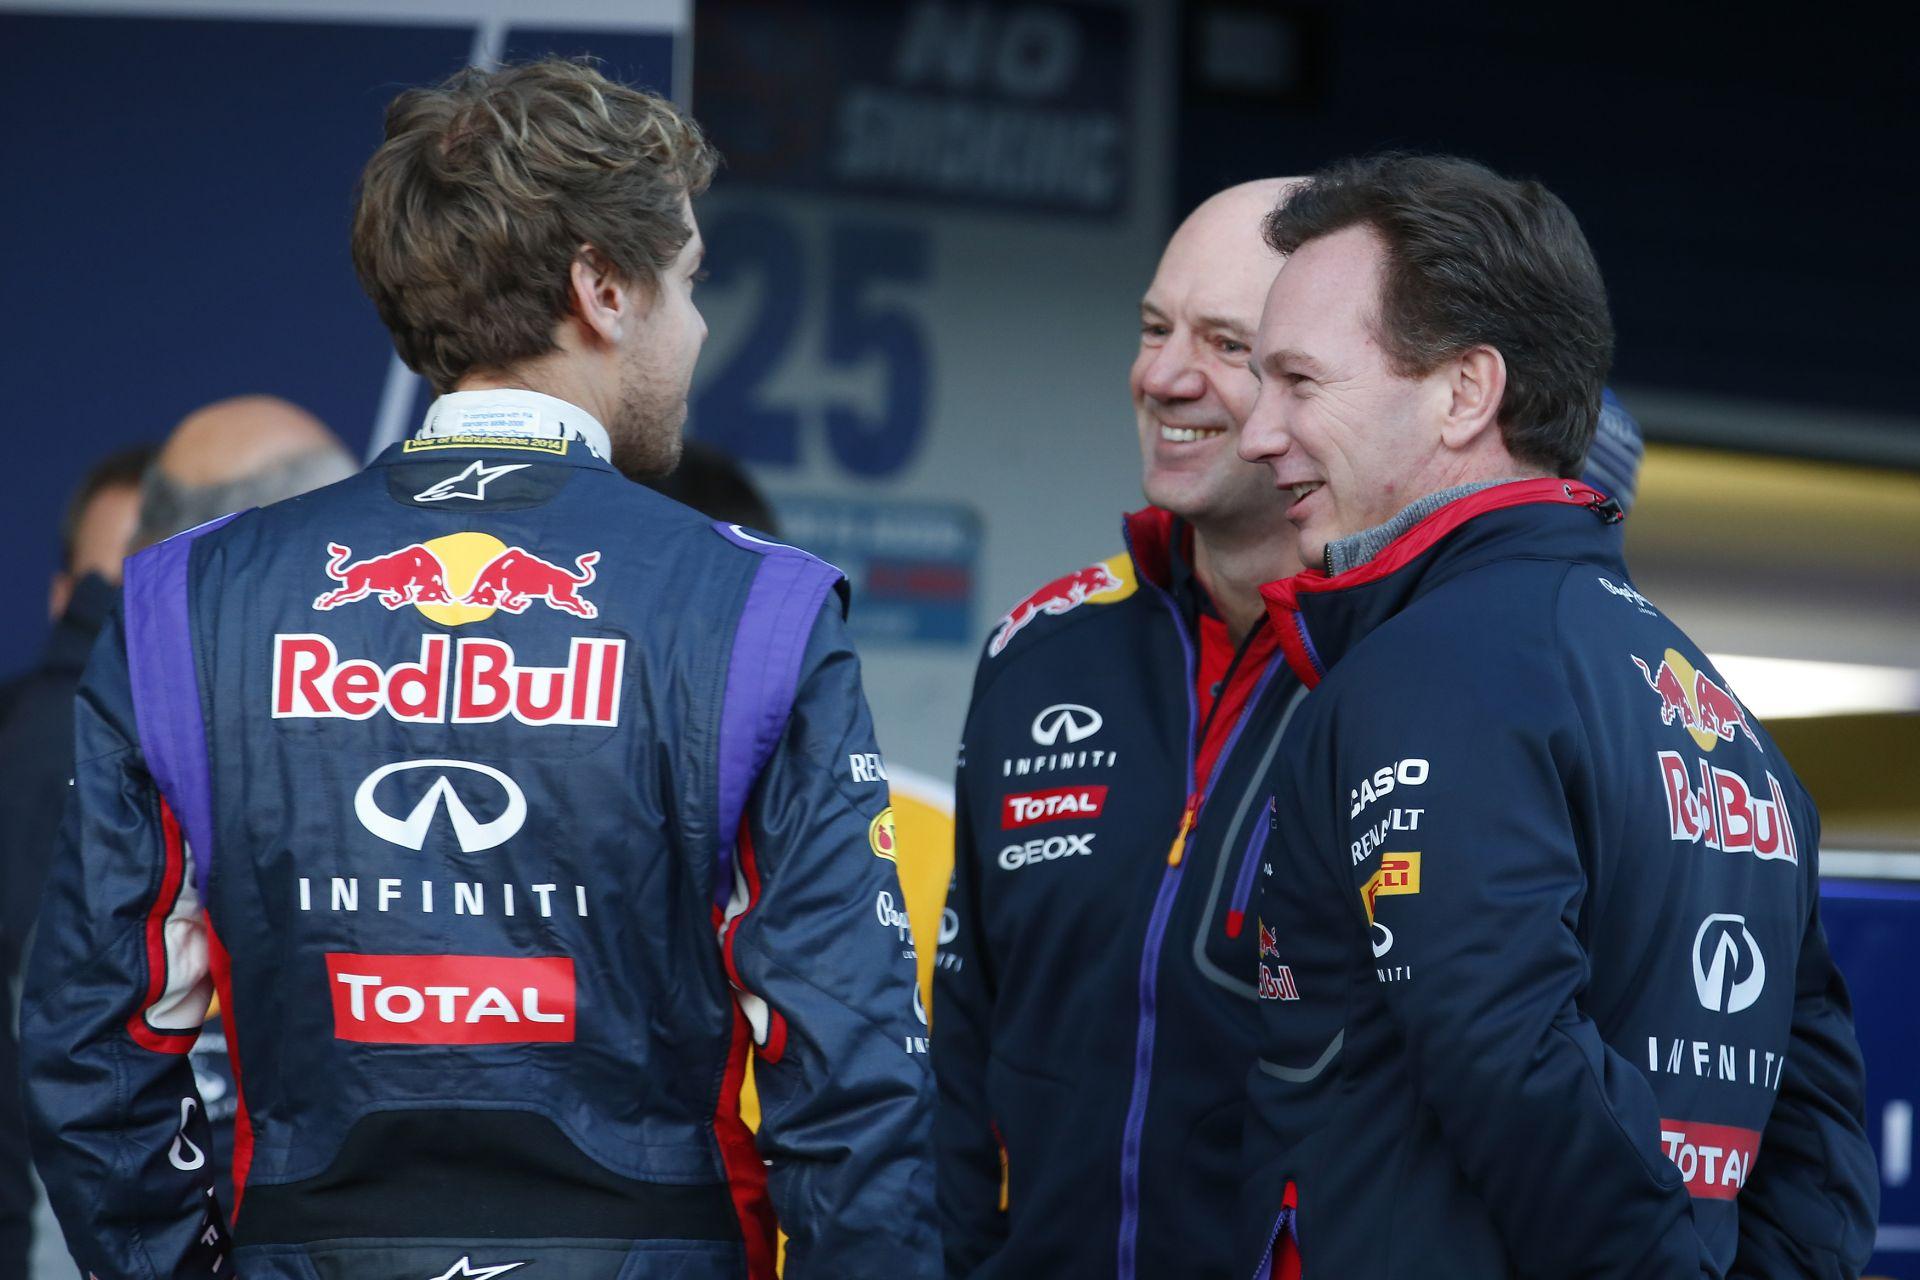 A Honda nem viccel: Newey, Vettel és Horner a McLarennél?